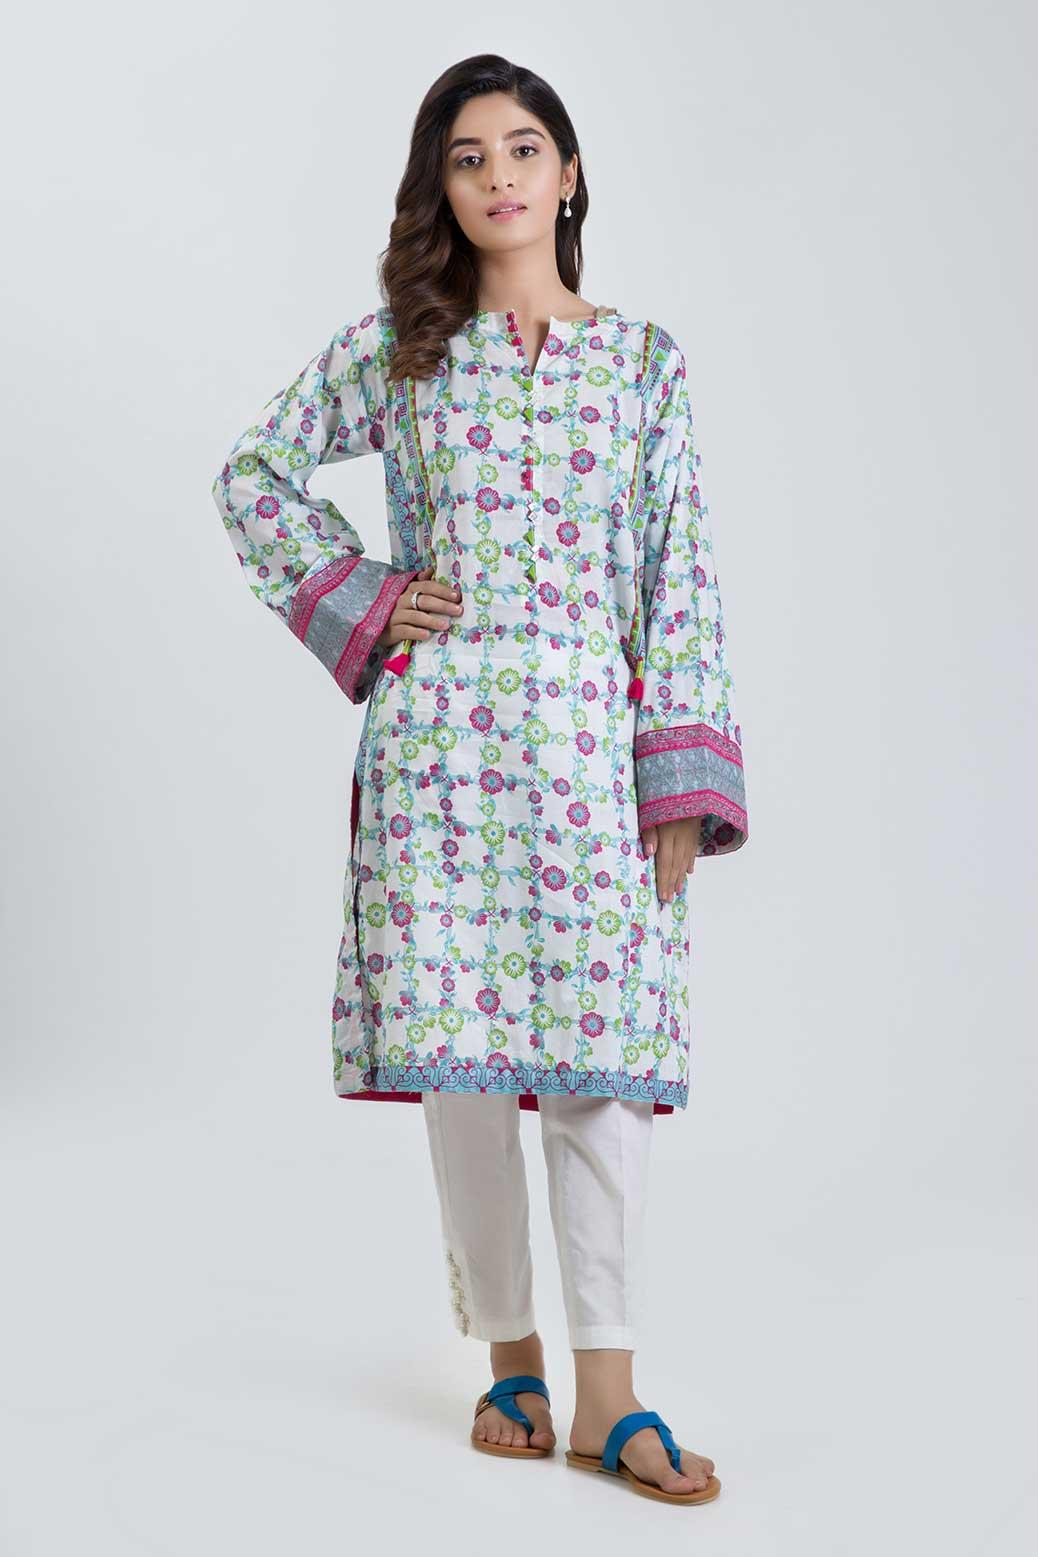 0feed891afd1 Bonanza Satrangi 2019  Summer Lawn Collection - Daraz.pk